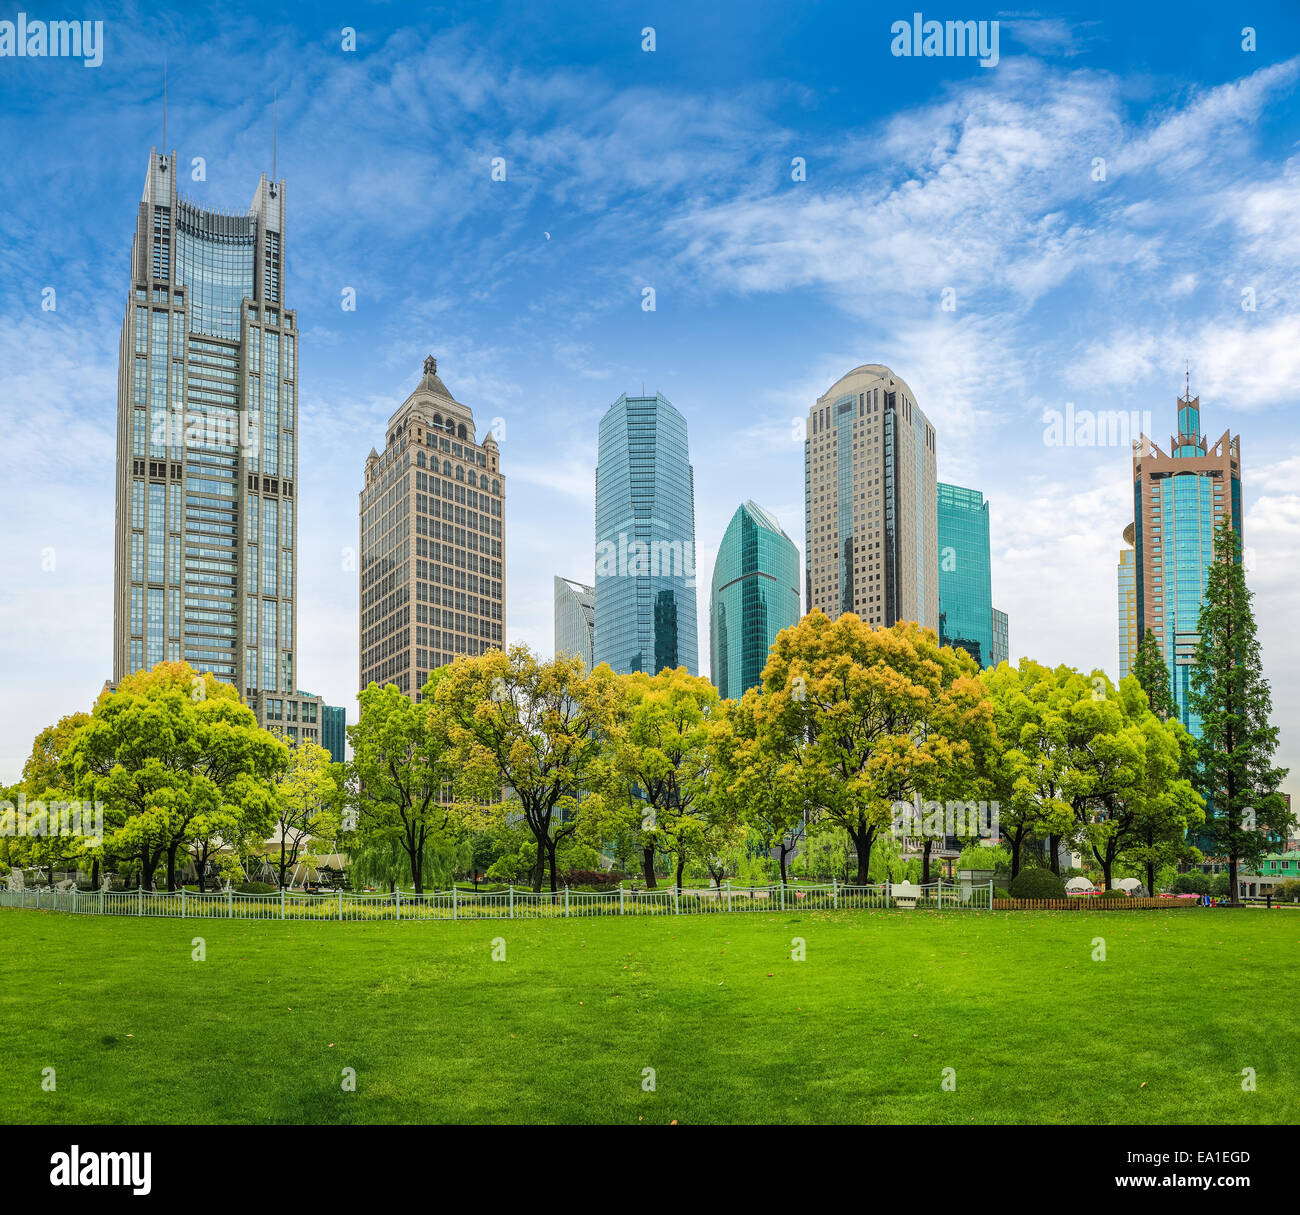 City park bâtiment moderne avec verdure Photo Stock